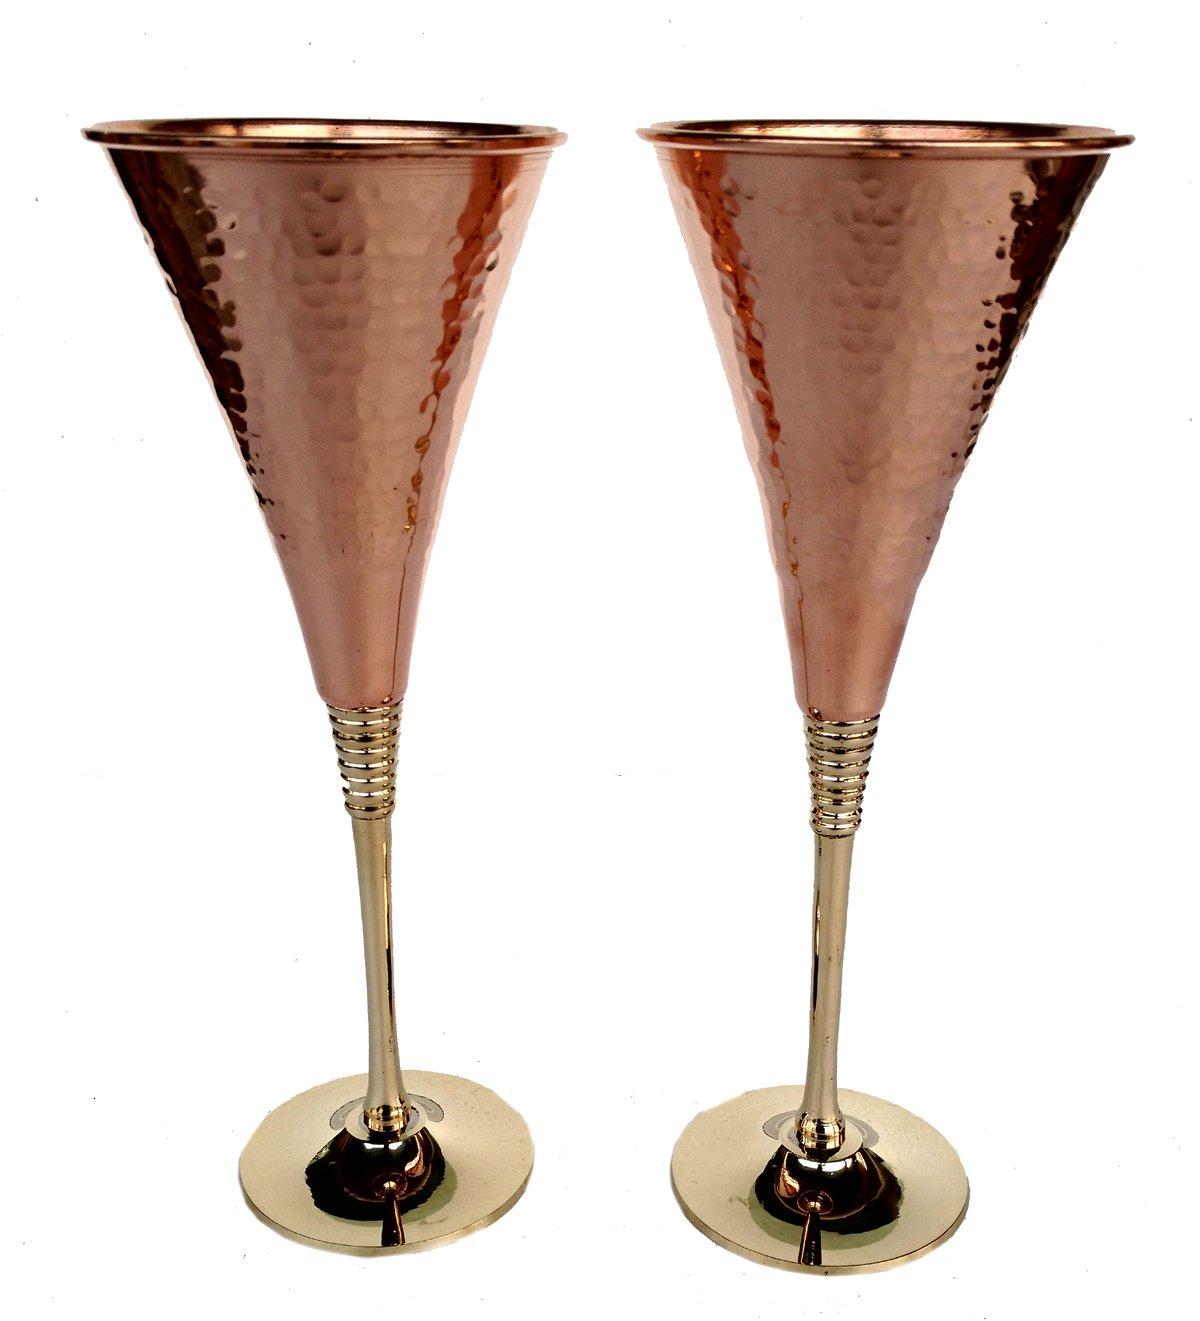 Rastogi Handicrafts Pure Copper Wine Glass Tableware Bar Hotel Restaurant Serving Wine Whisky Cocktail Goblet Set of (2)